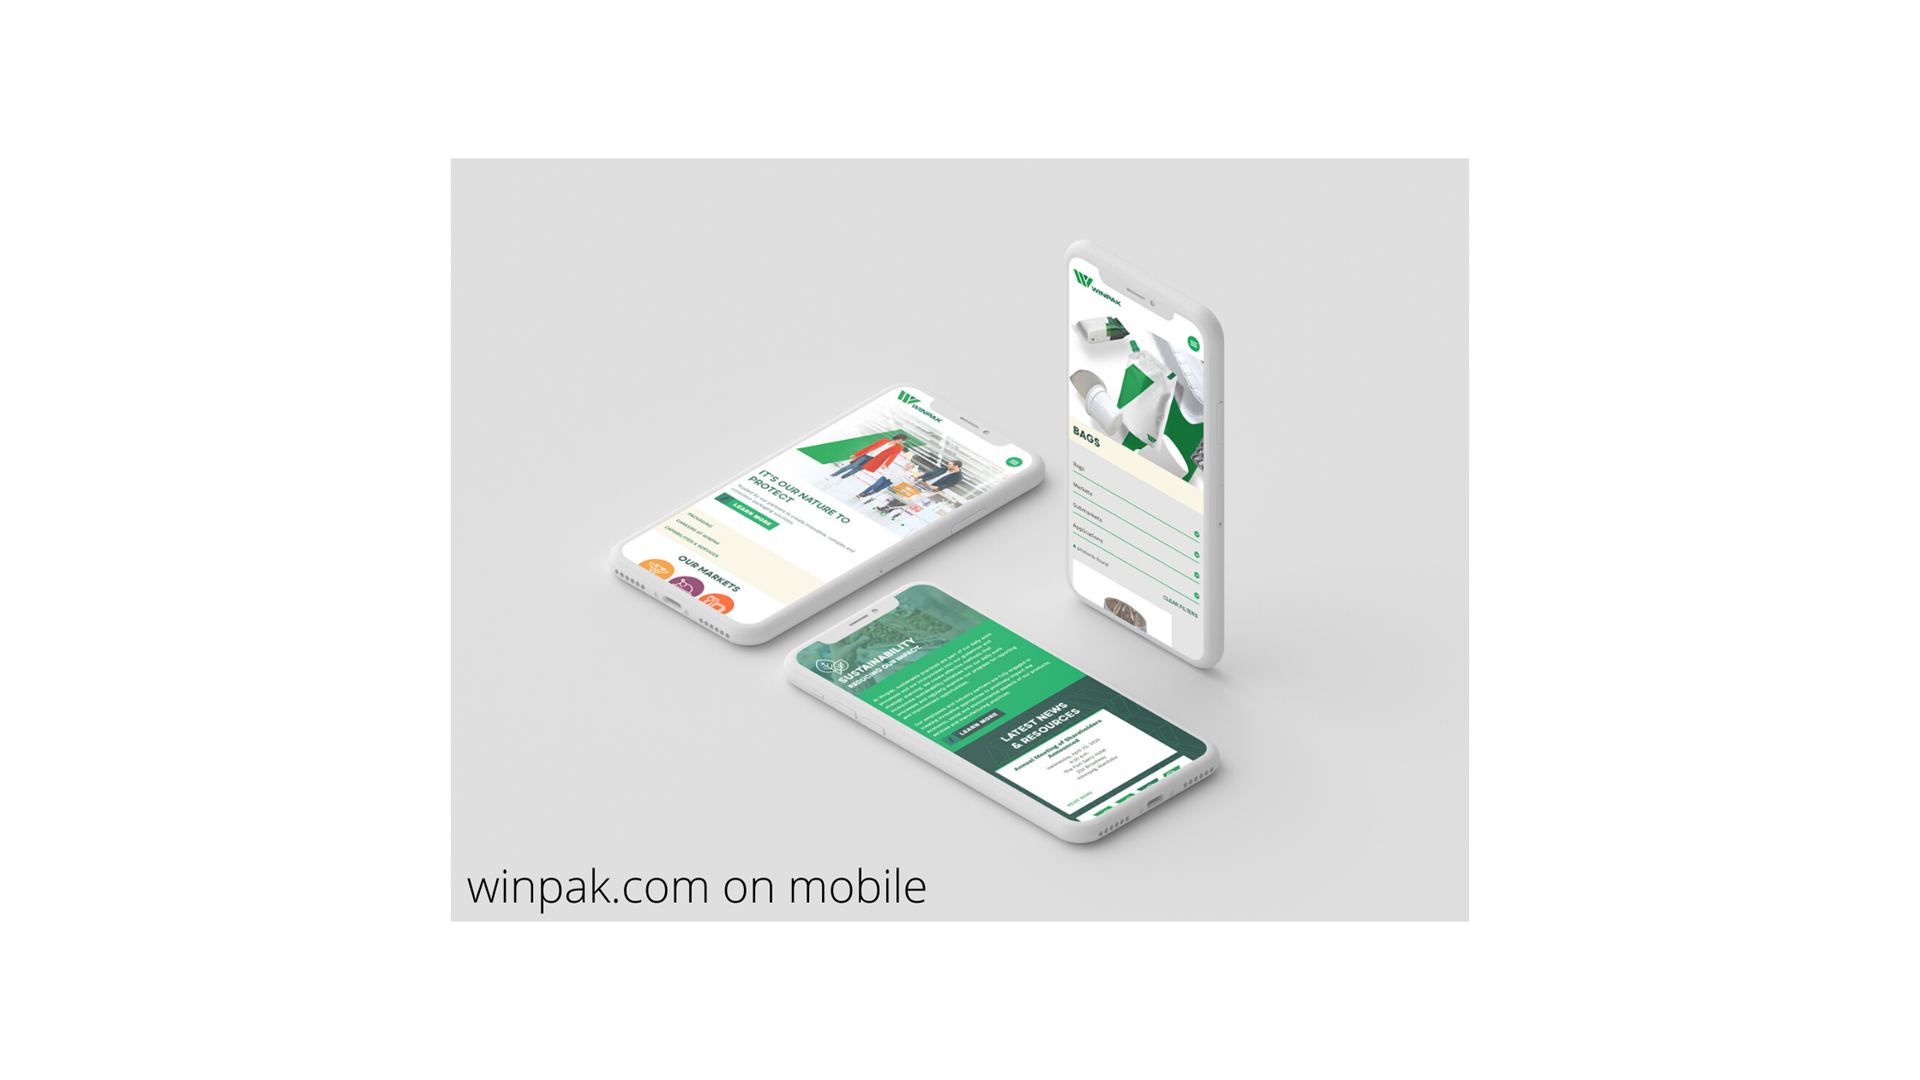 Edge summer 2020 - accessibility Winpak mobile